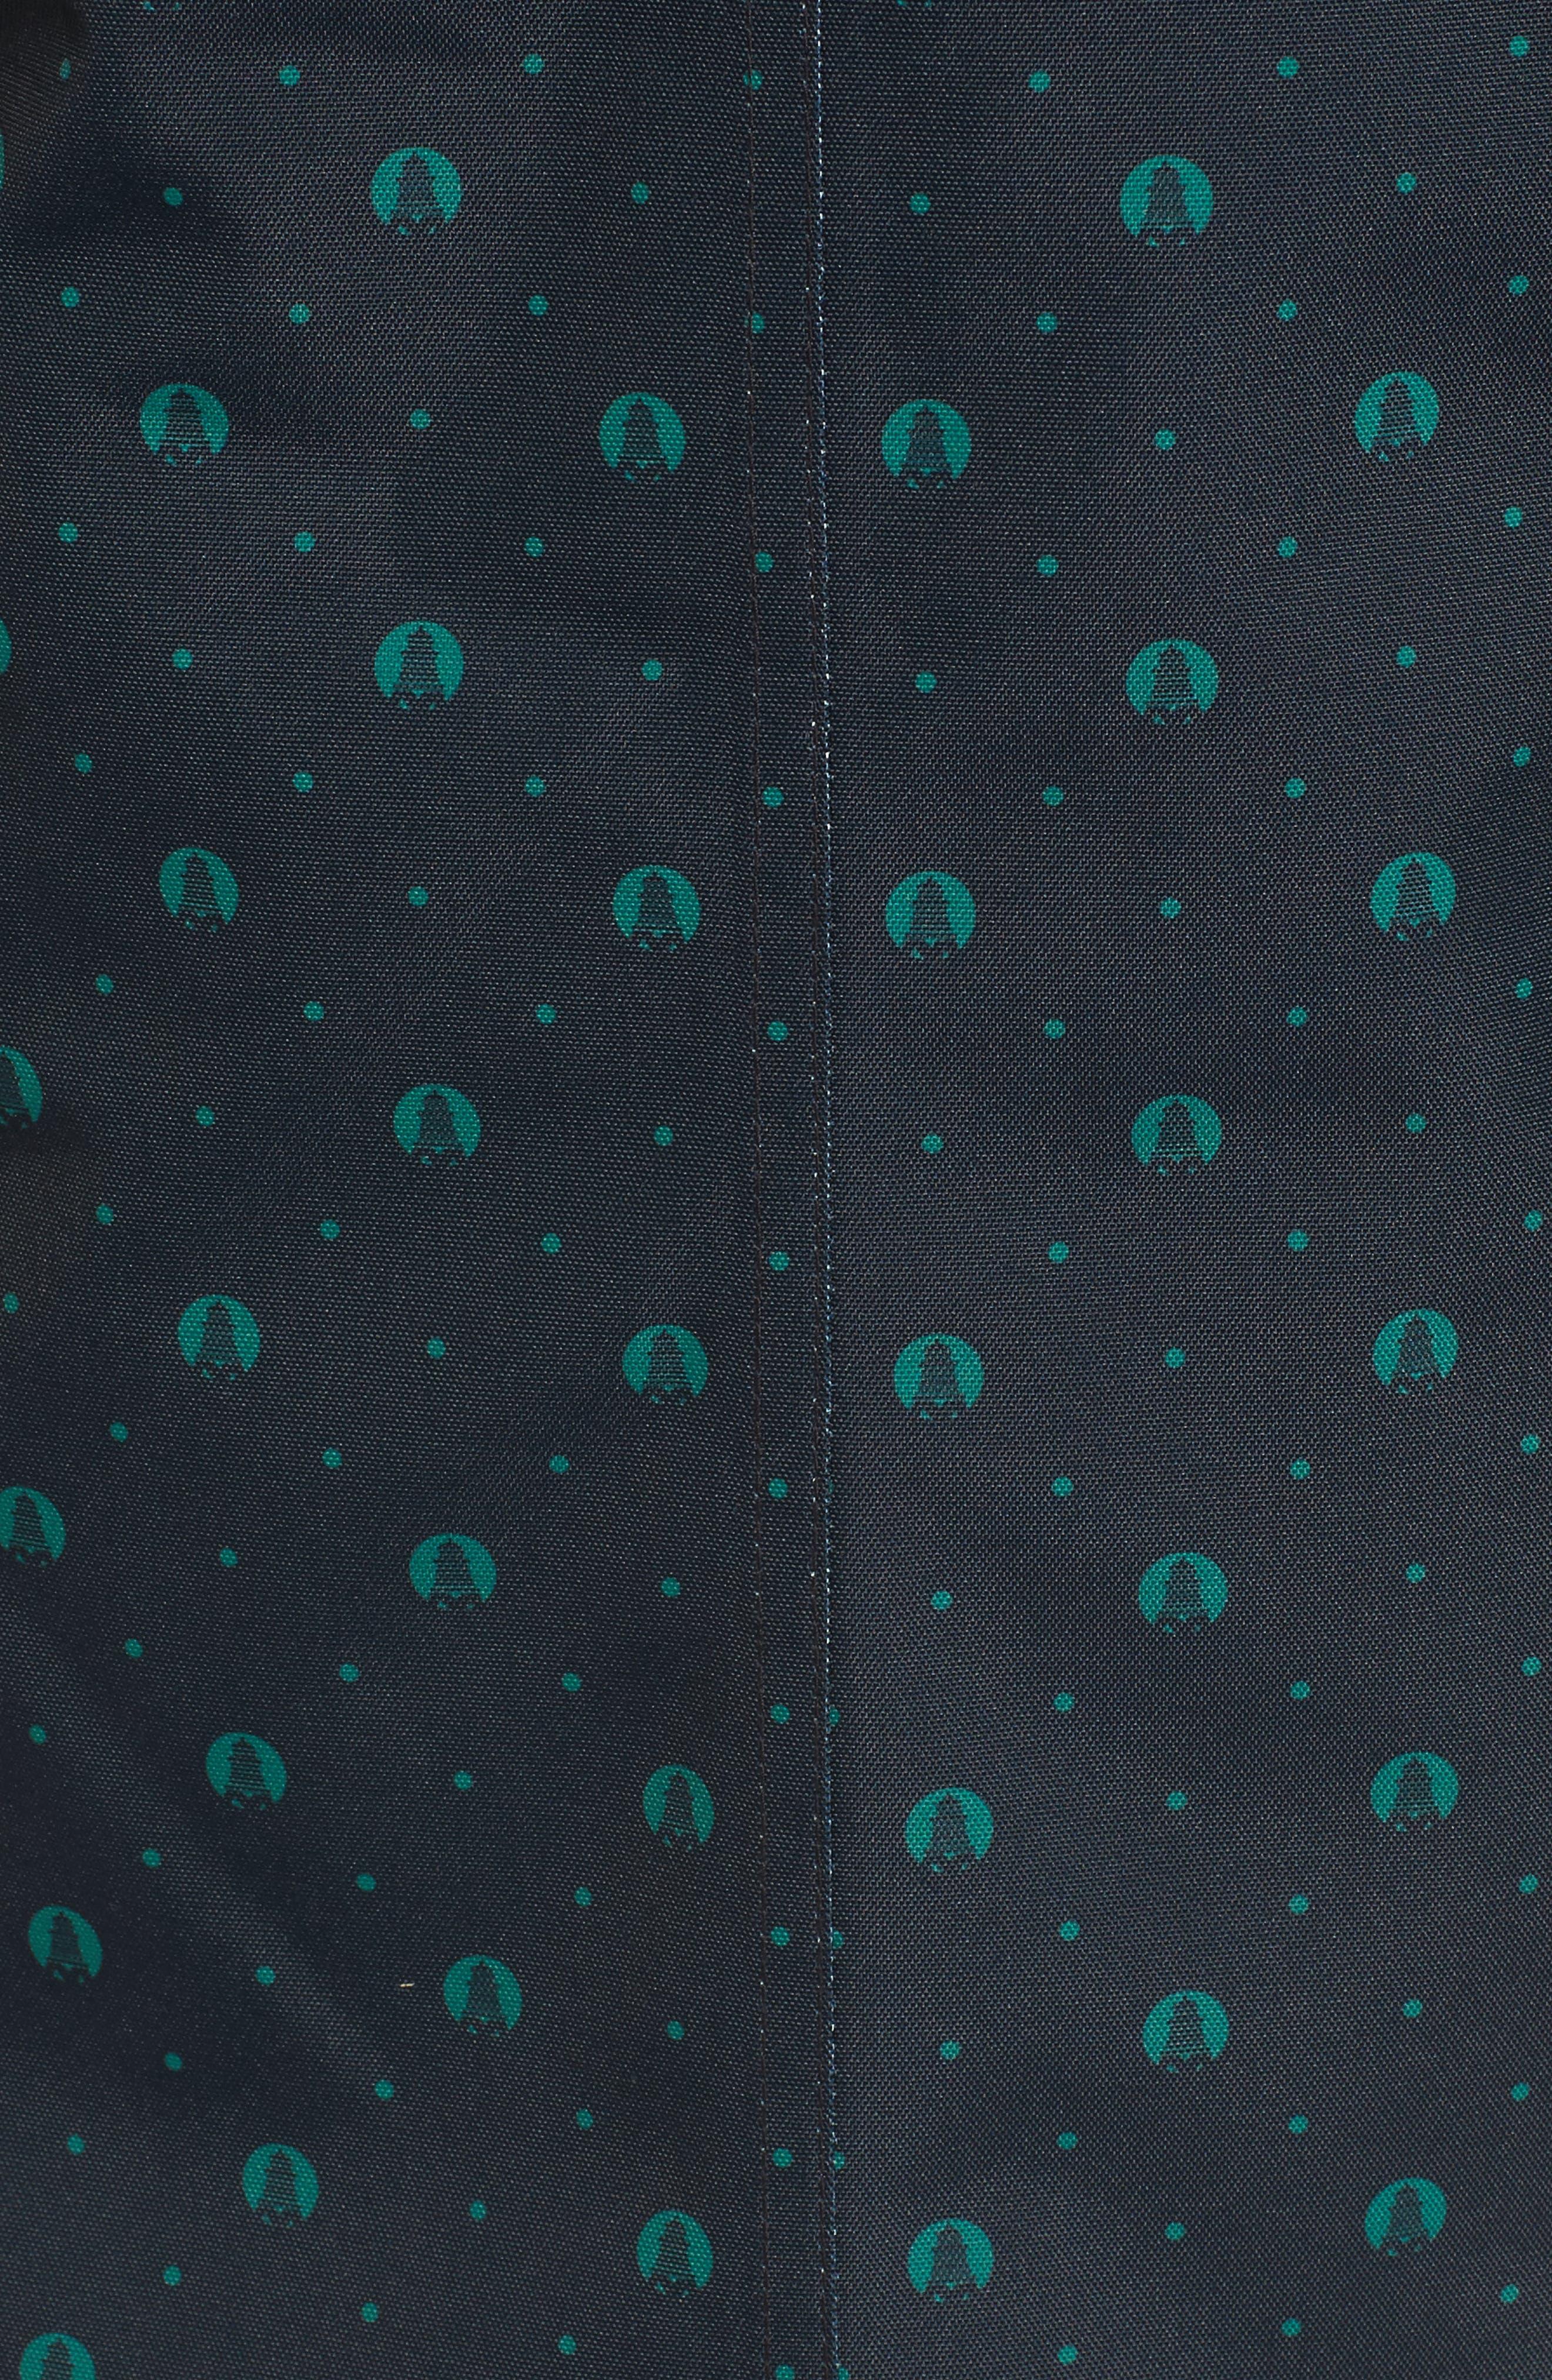 Decoy Anorak Jacket,                             Alternate thumbnail 5, color,                             Navy / Evergreen Beacon S